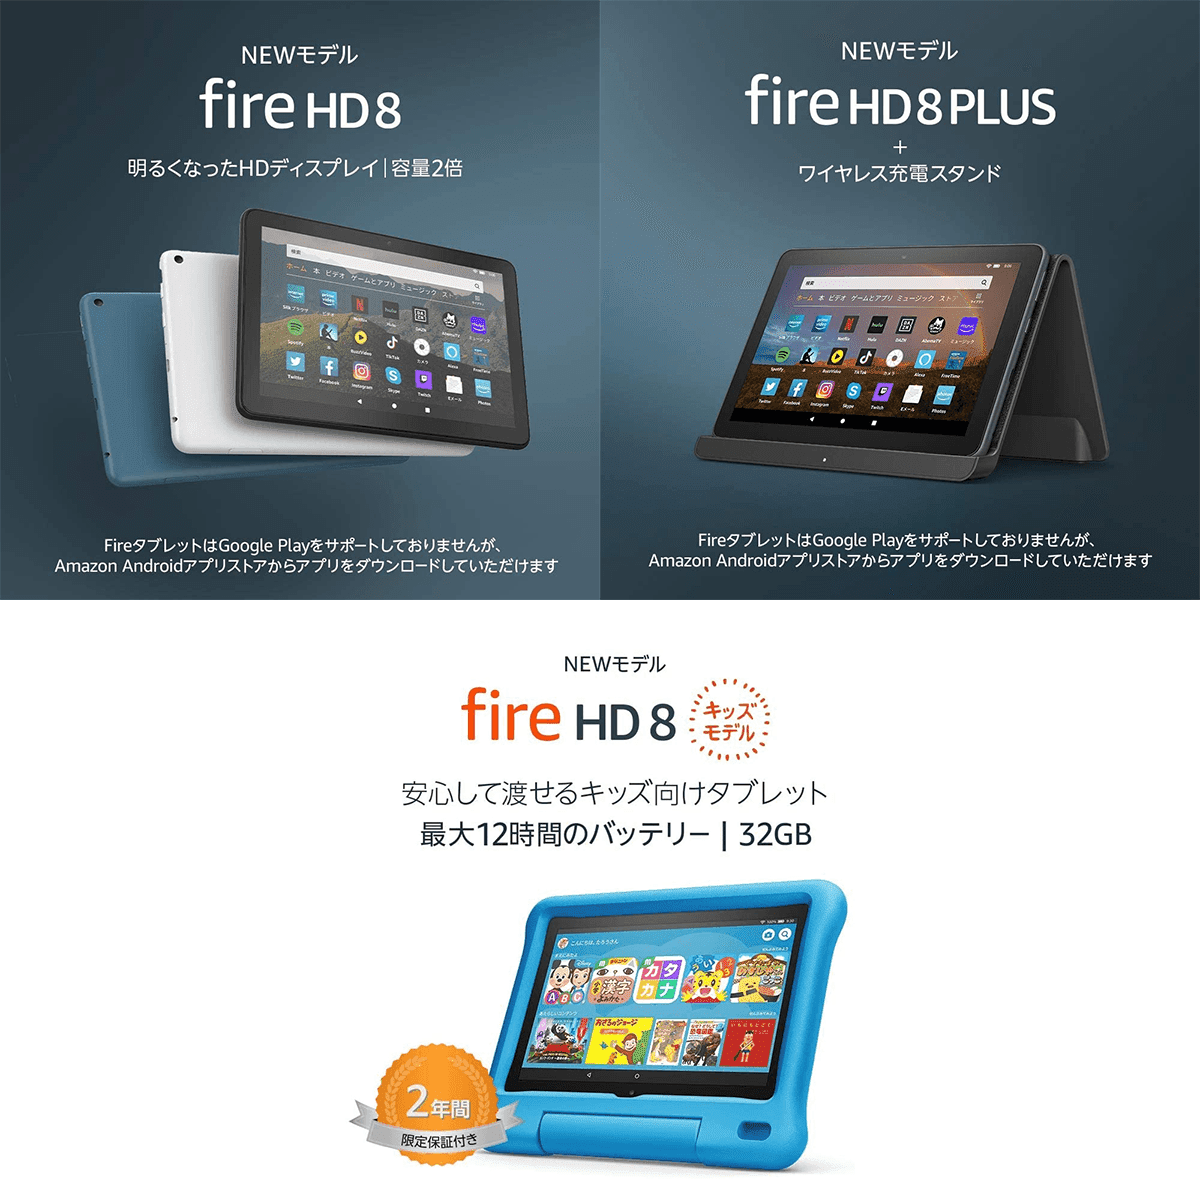 Amazon 8インチタブレット Fire Hd 8 に3つの新機種 Fire Hd 8 Fire Hd 8 Plus キッズモデルが登場